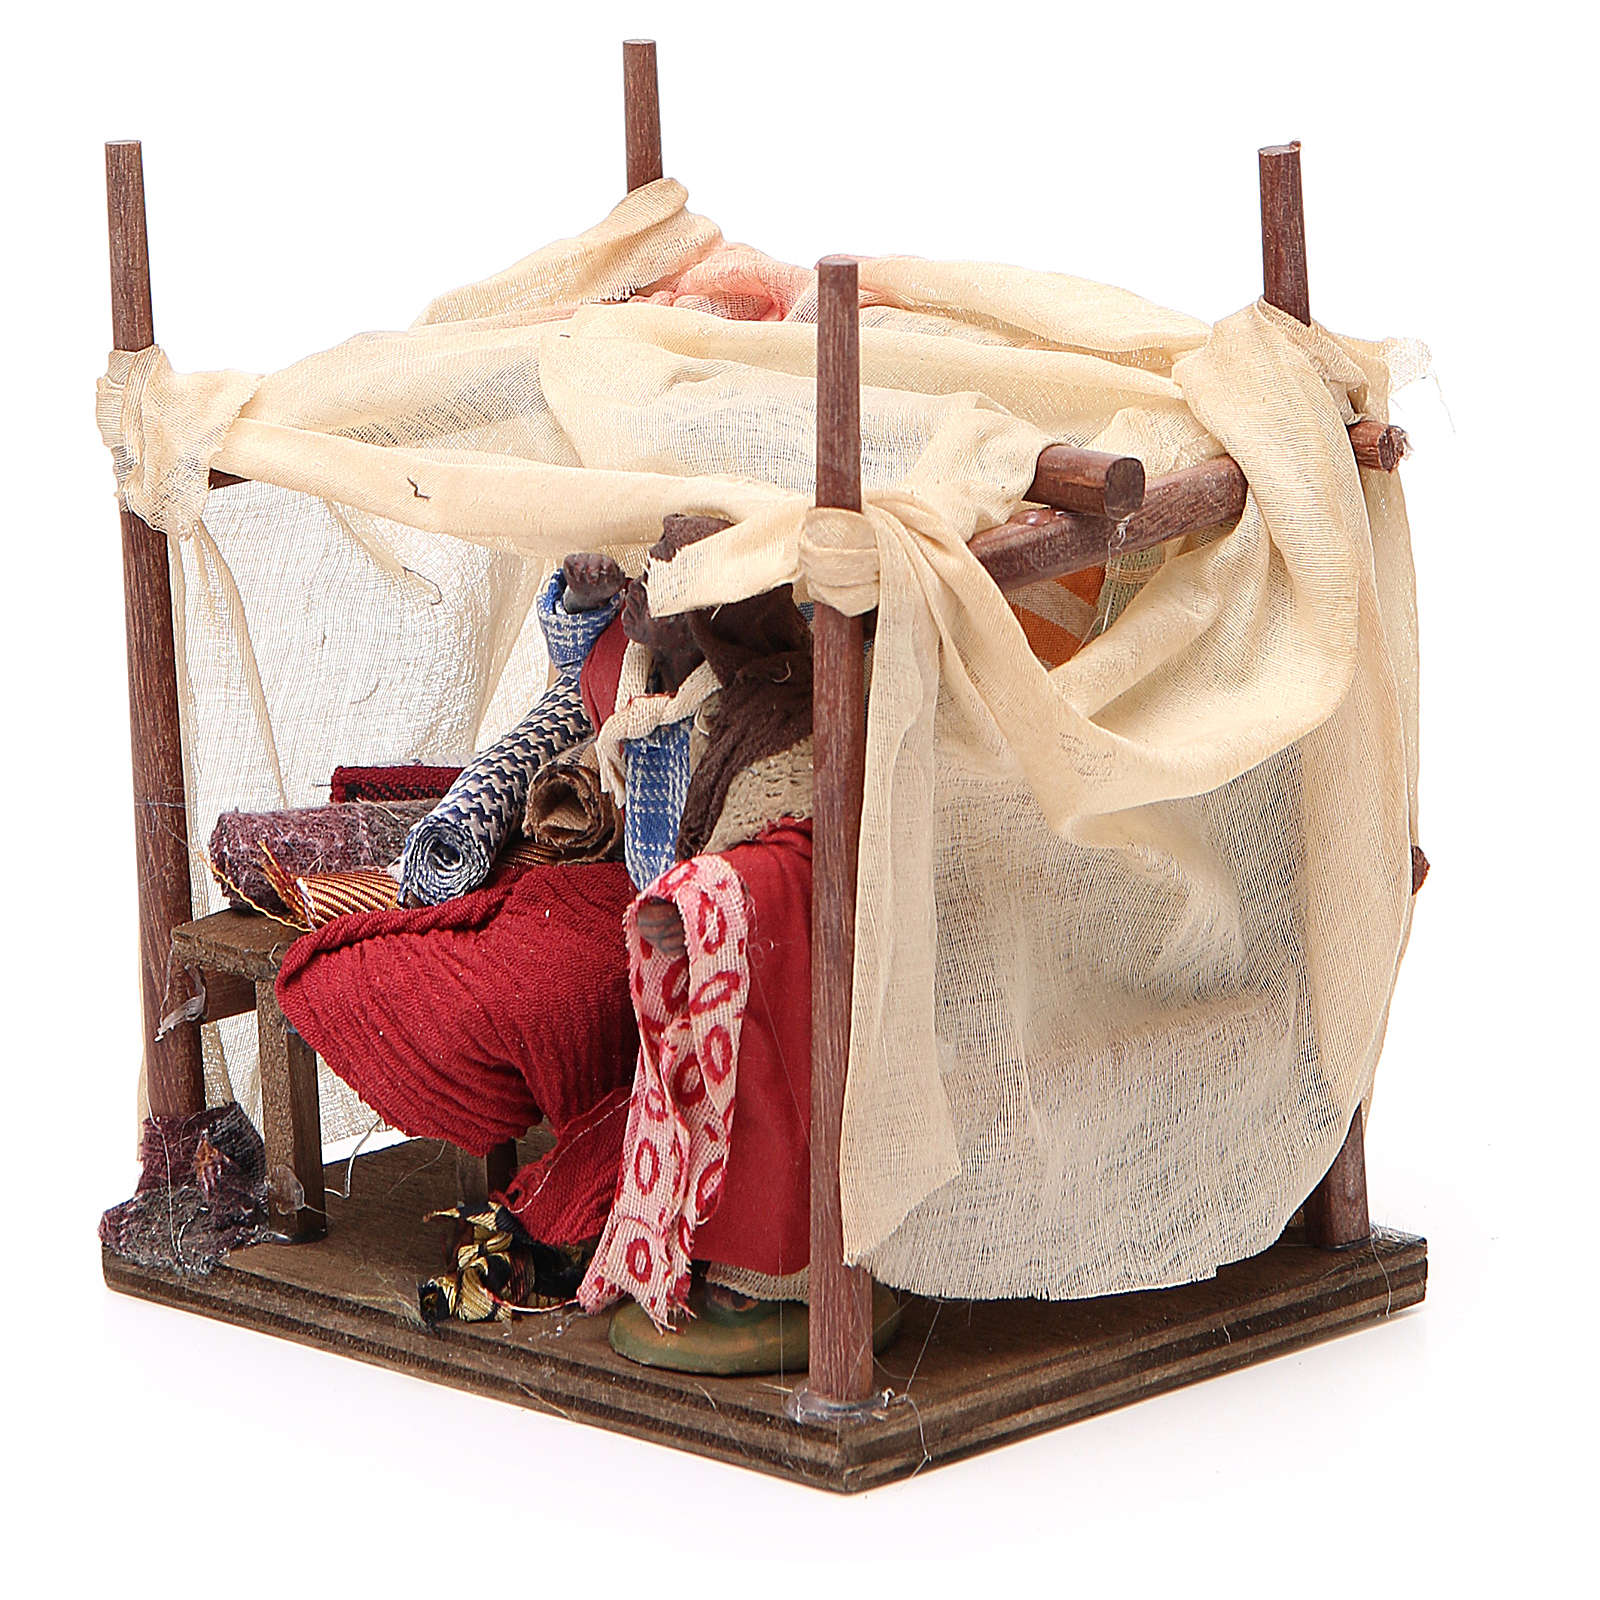 Merchant with tent for Neapolitan nativity, 10cm 4